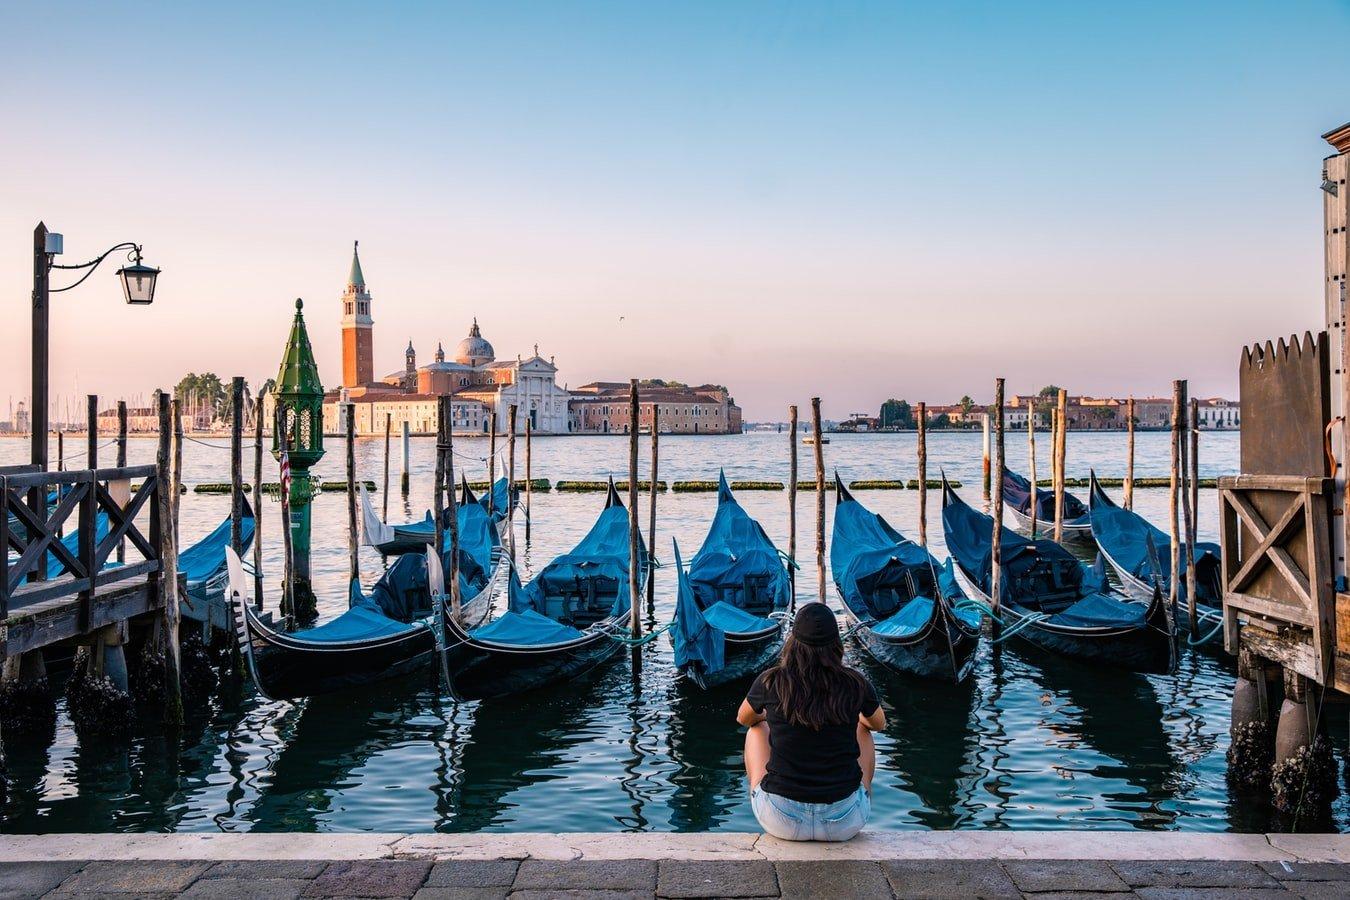 Gondelhafen mit Blick auf San Giorgio Maggiore in Venedig Italien